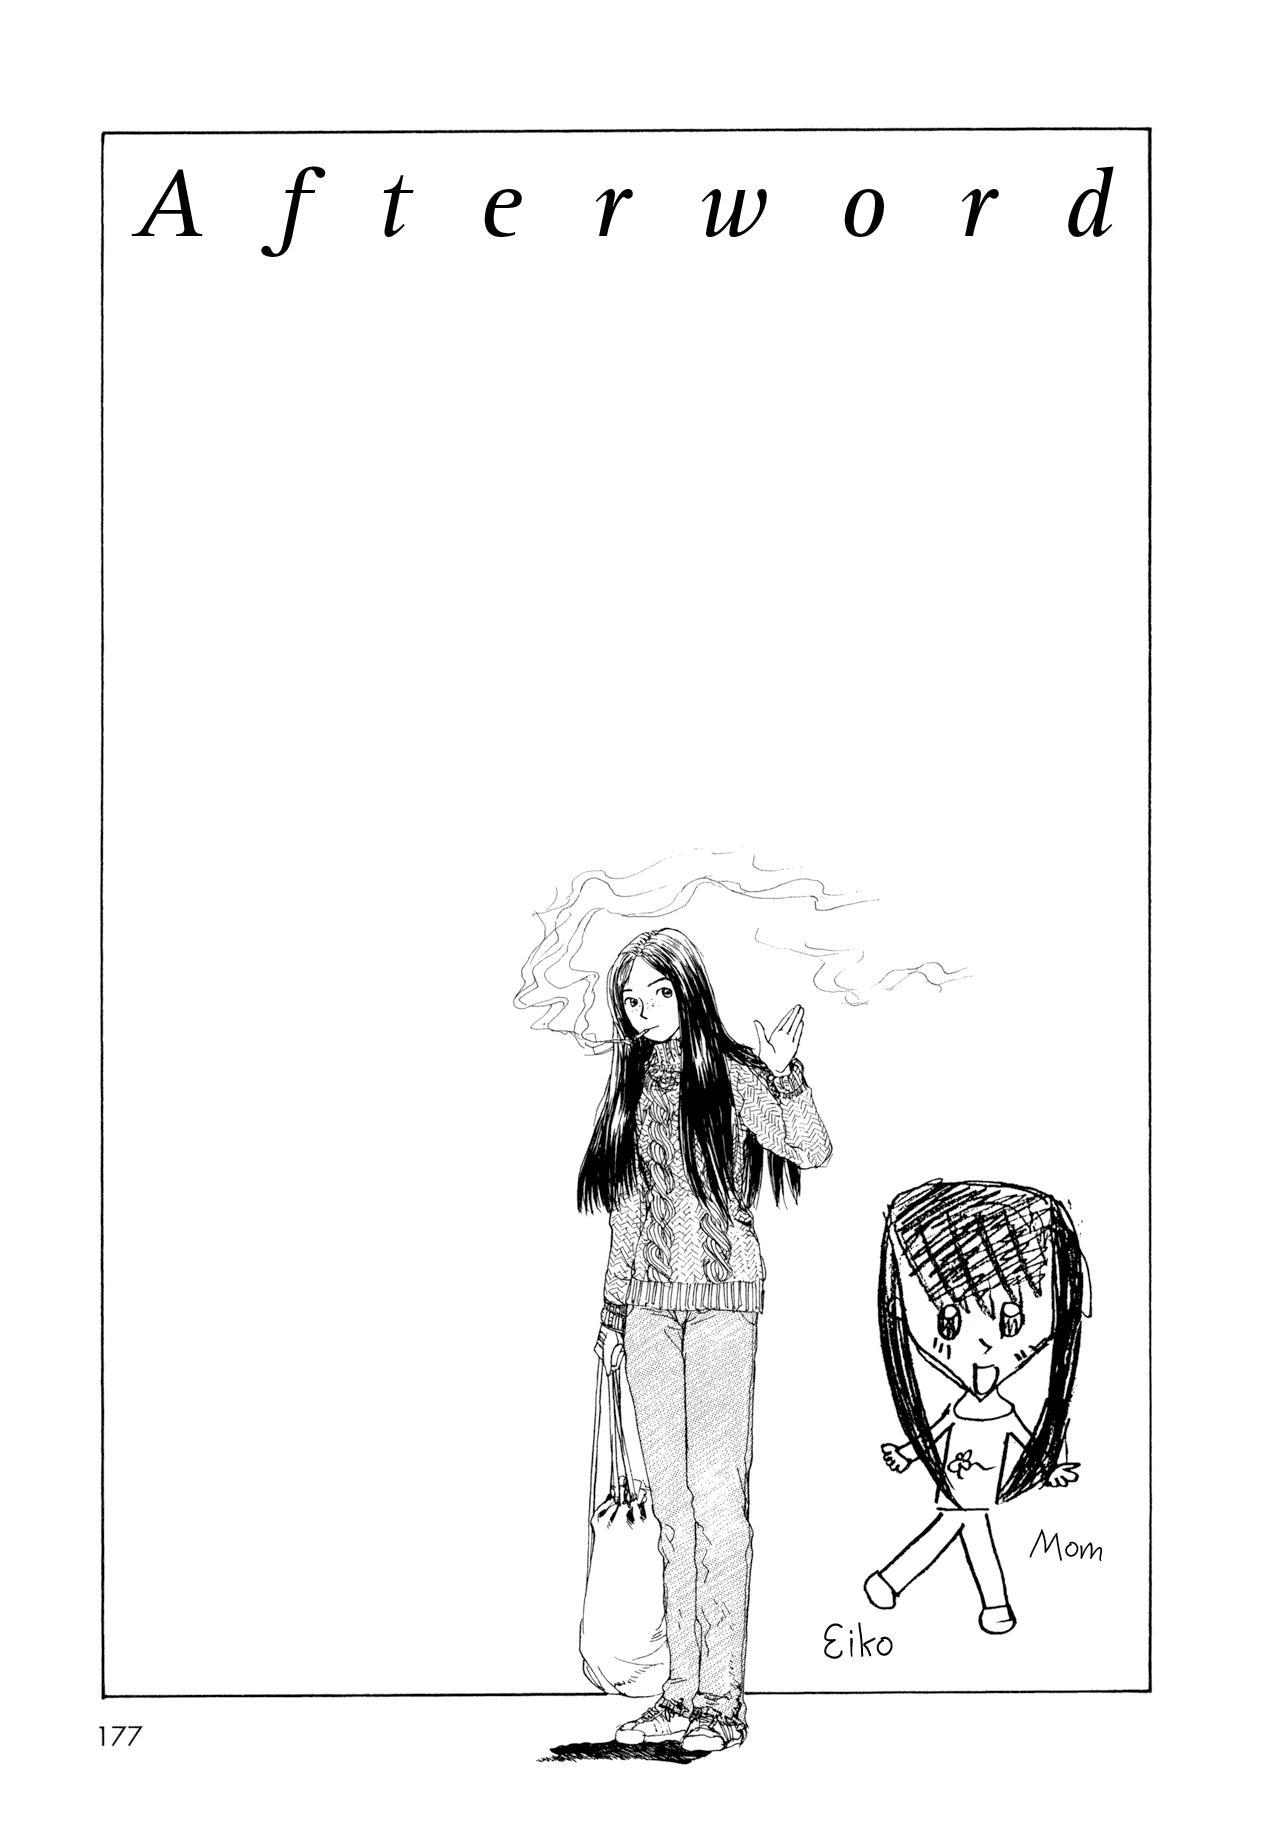 https://img2.nineanime.com/comics/pic2/63/31679/871463/fca7e253c31b4cff99440a716524a32b.jpg Page 1